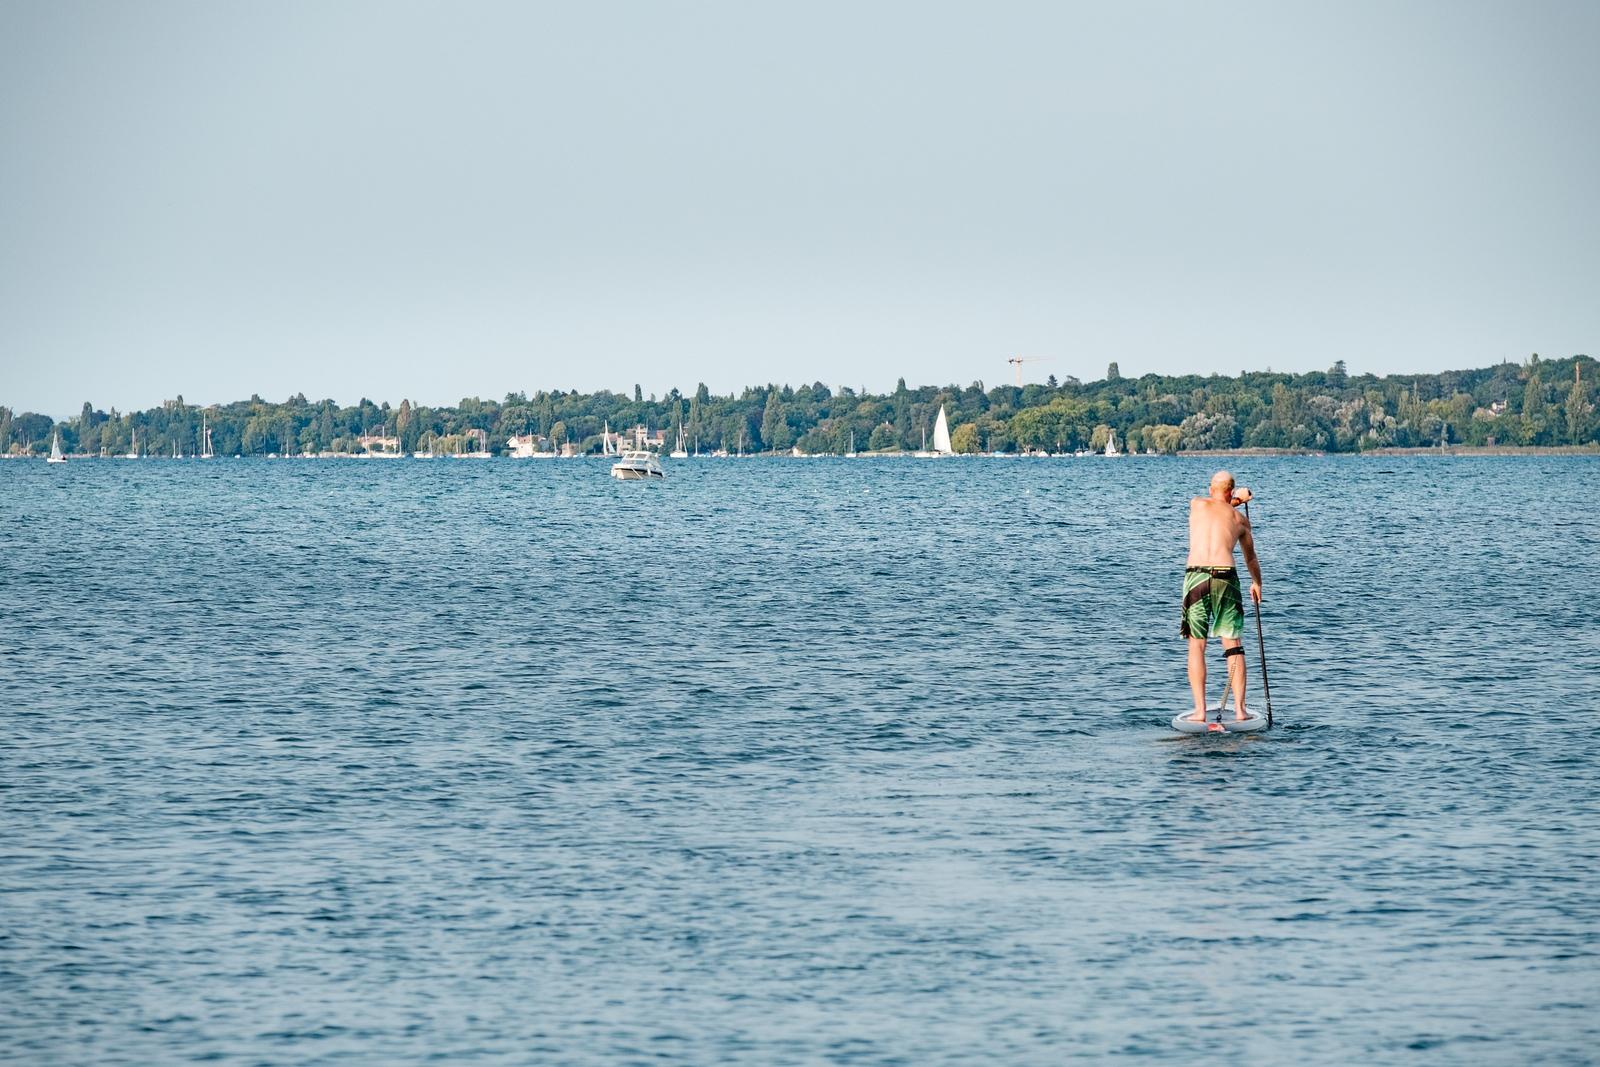 A man on a paddle board on lake Geneva